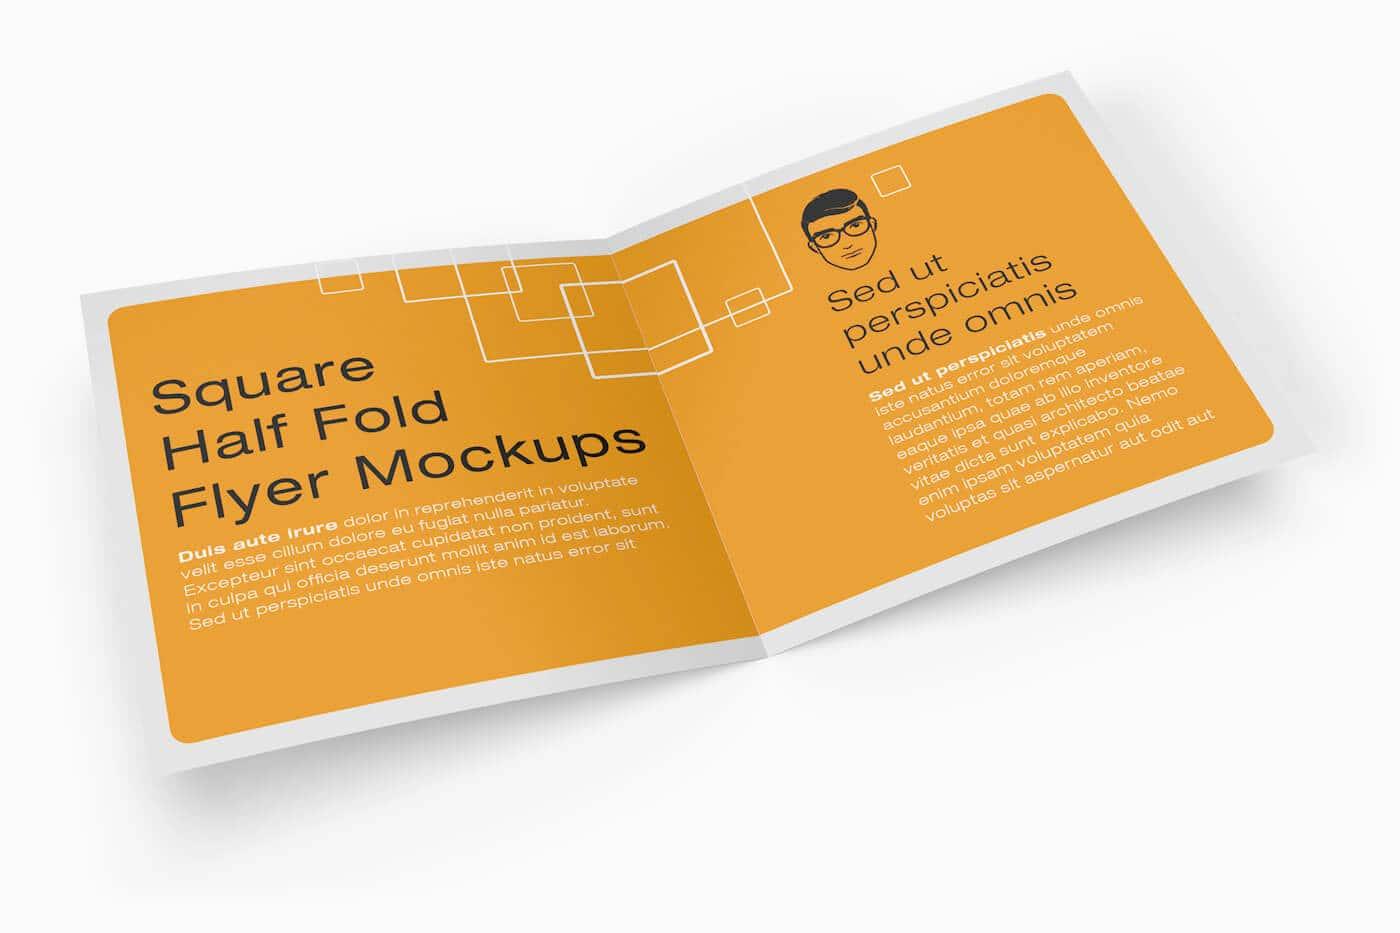 Square Half Fold Brochure Mockups 02 1